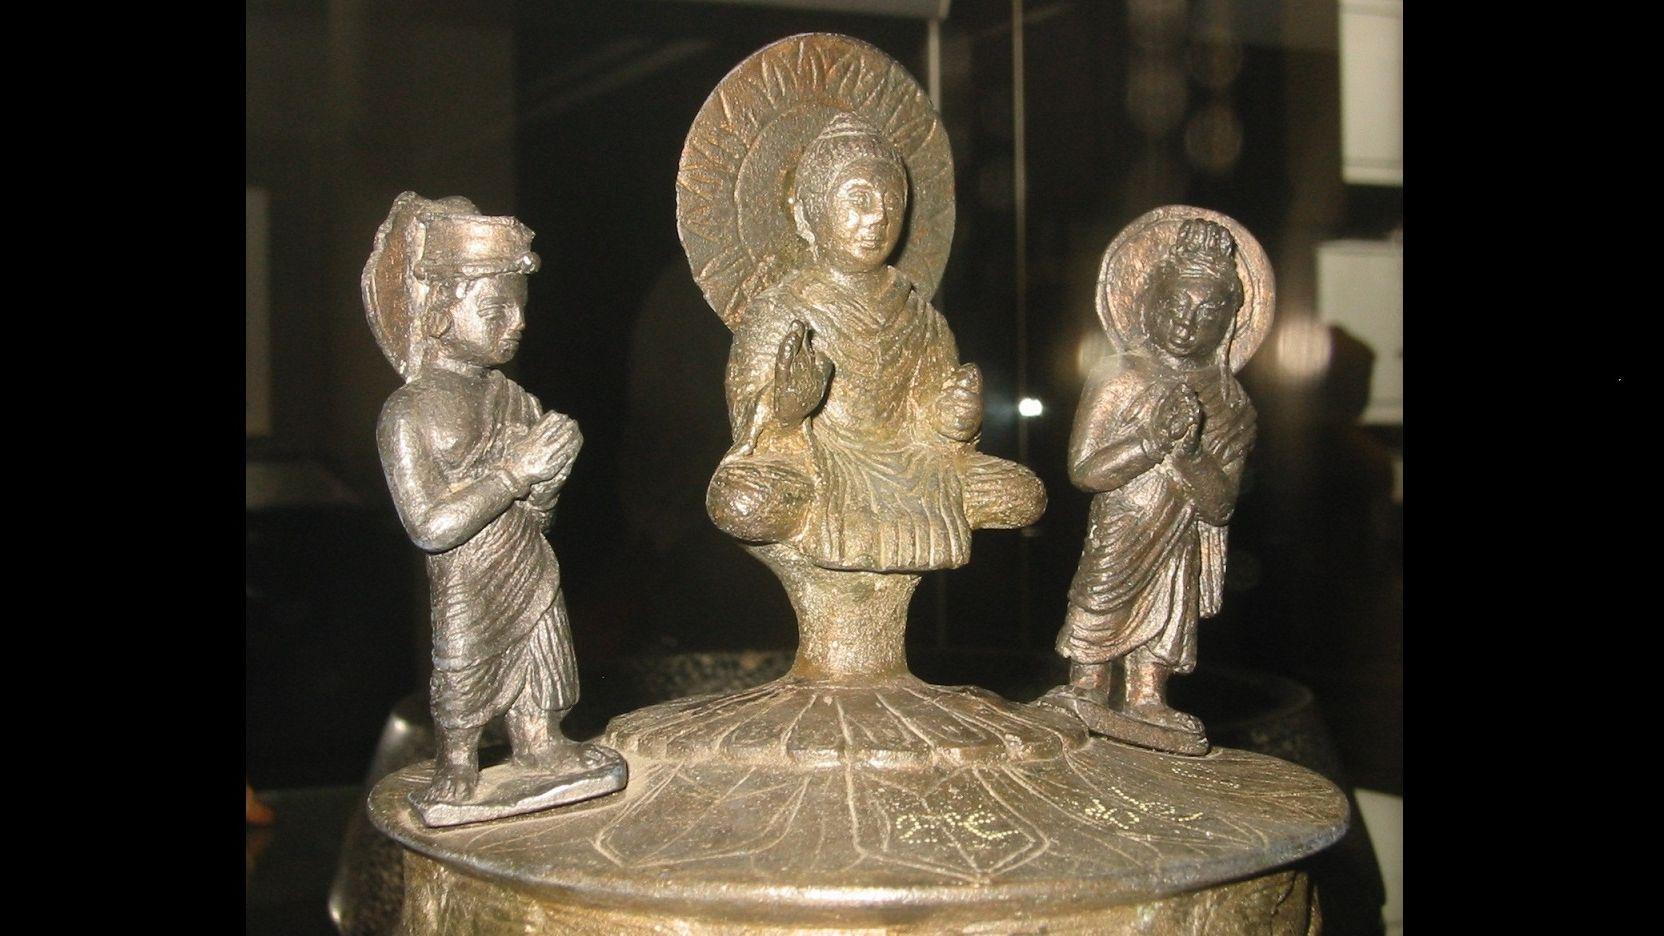 The Vanishing Stupa and a Buried Casket of Emperor Kanishka